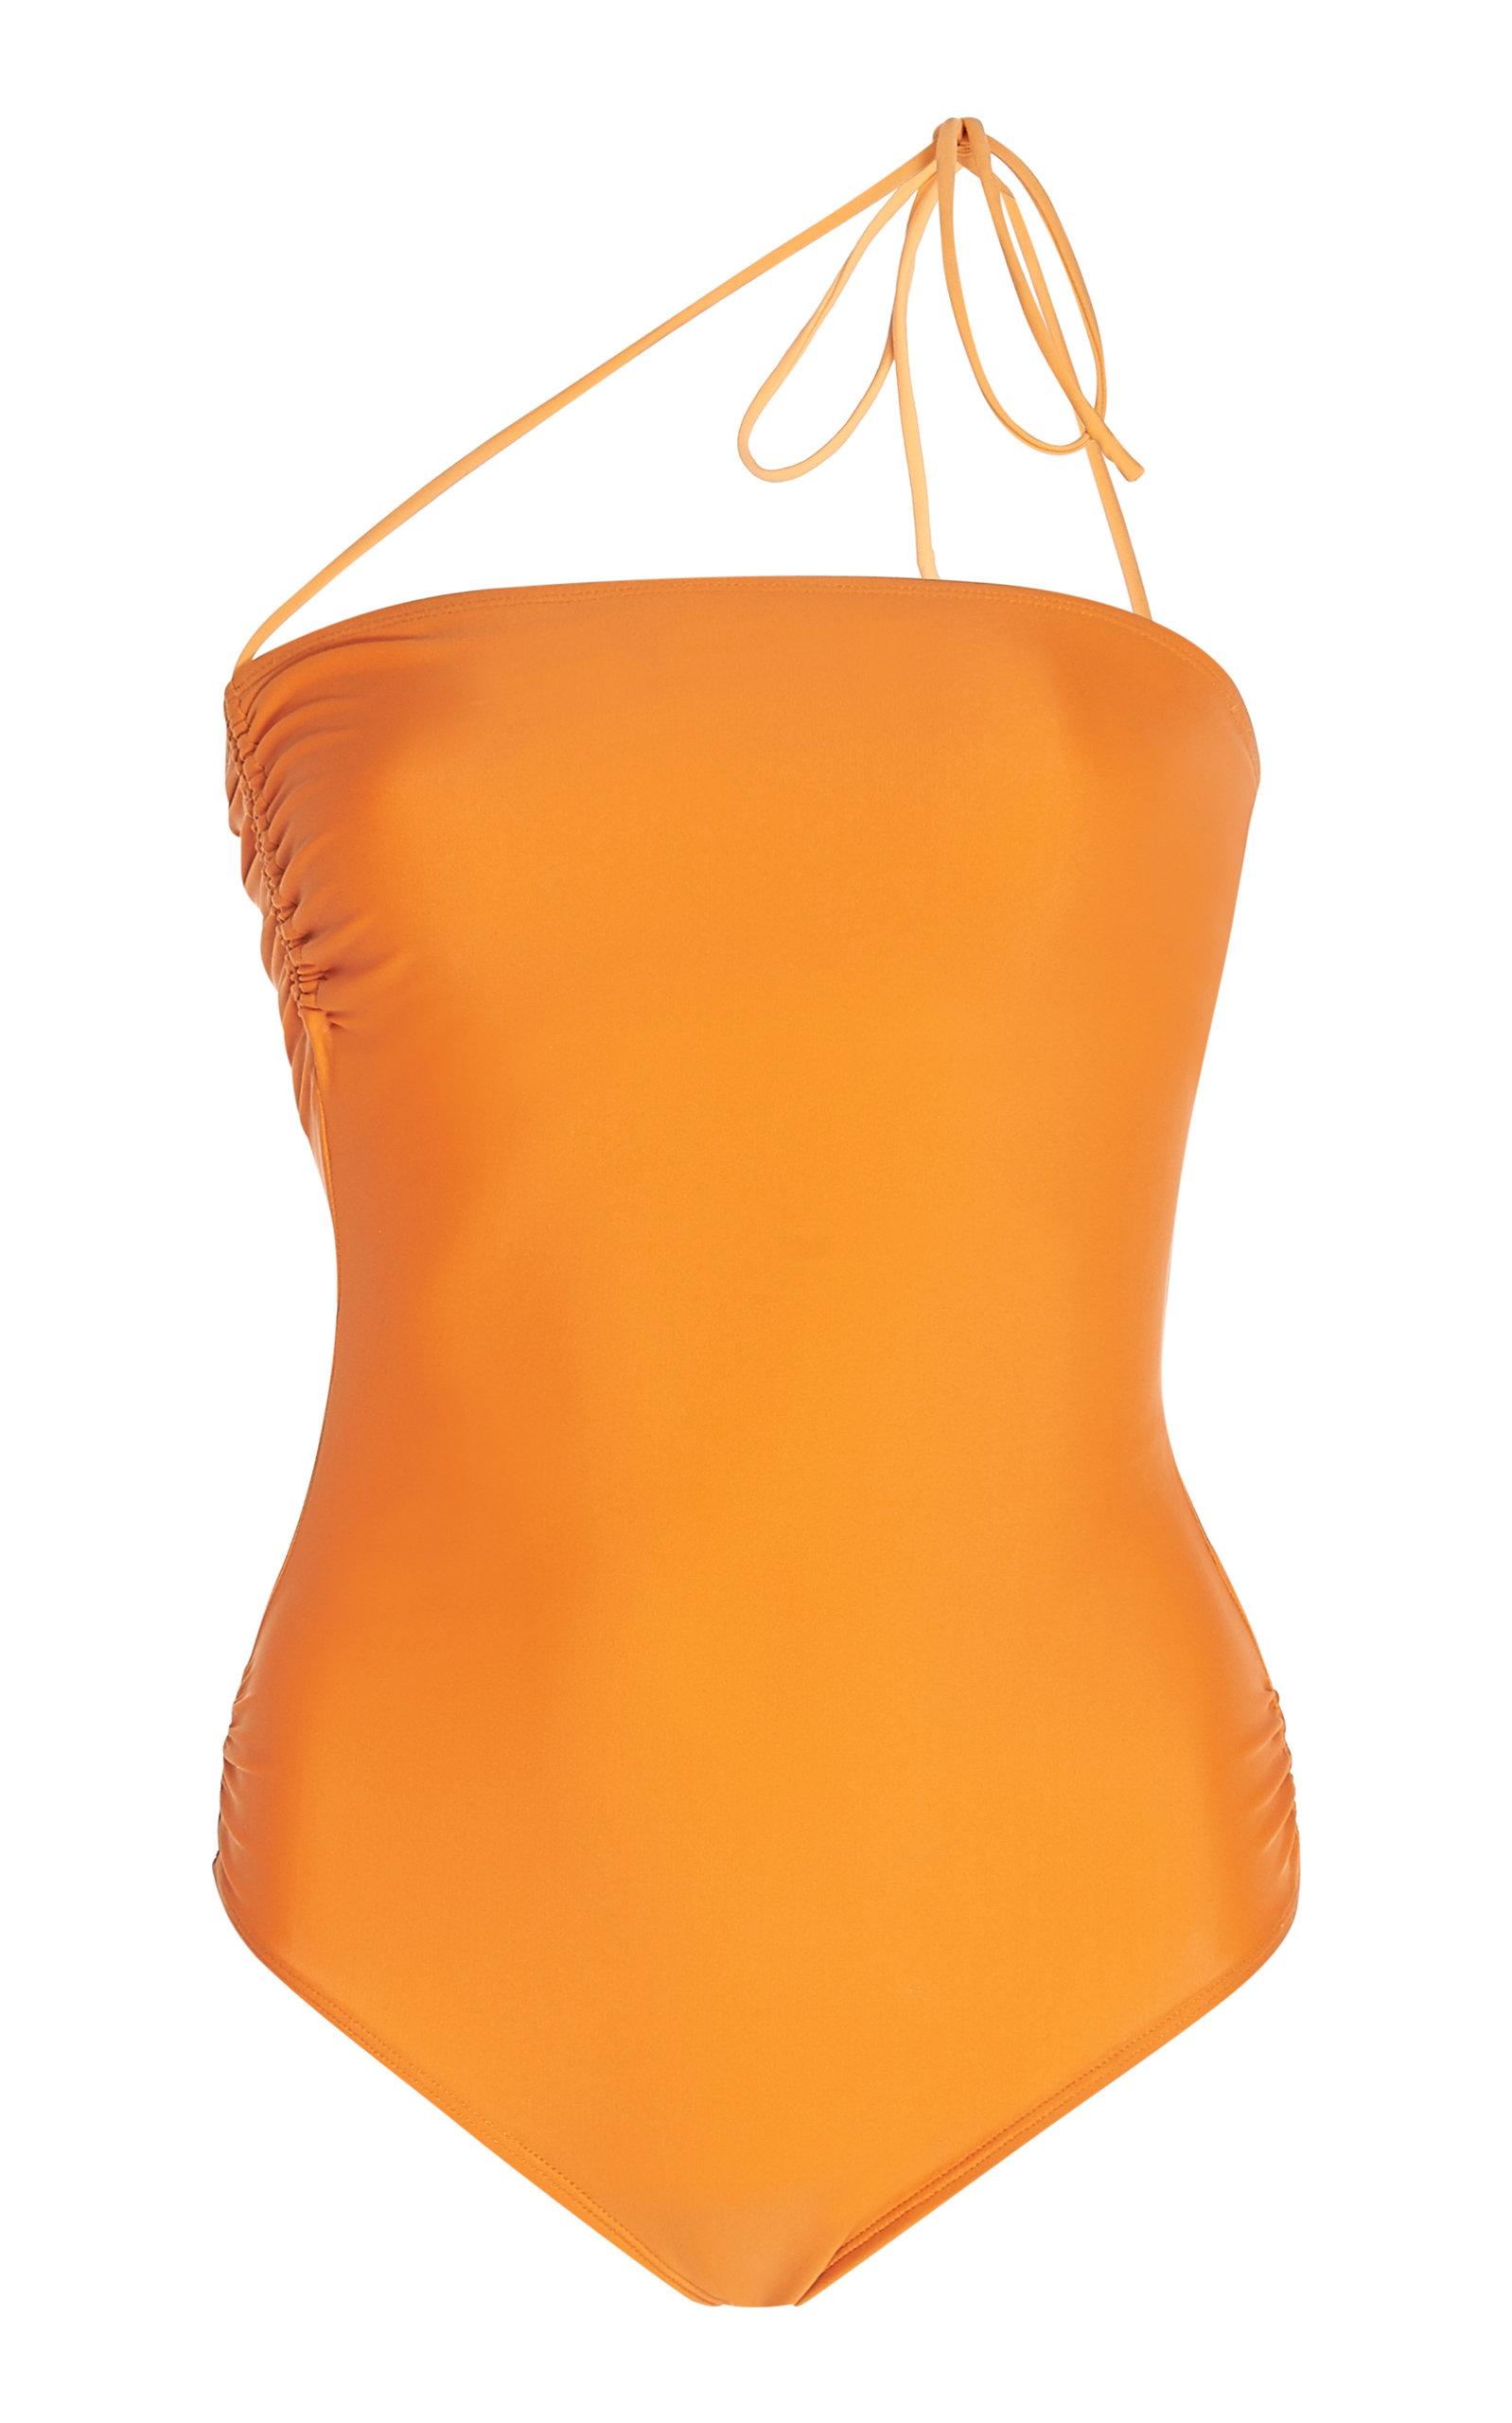 c527fbb84f5 New Swimsuit Trends 2019 Cool Bikini, One-Piece Styles